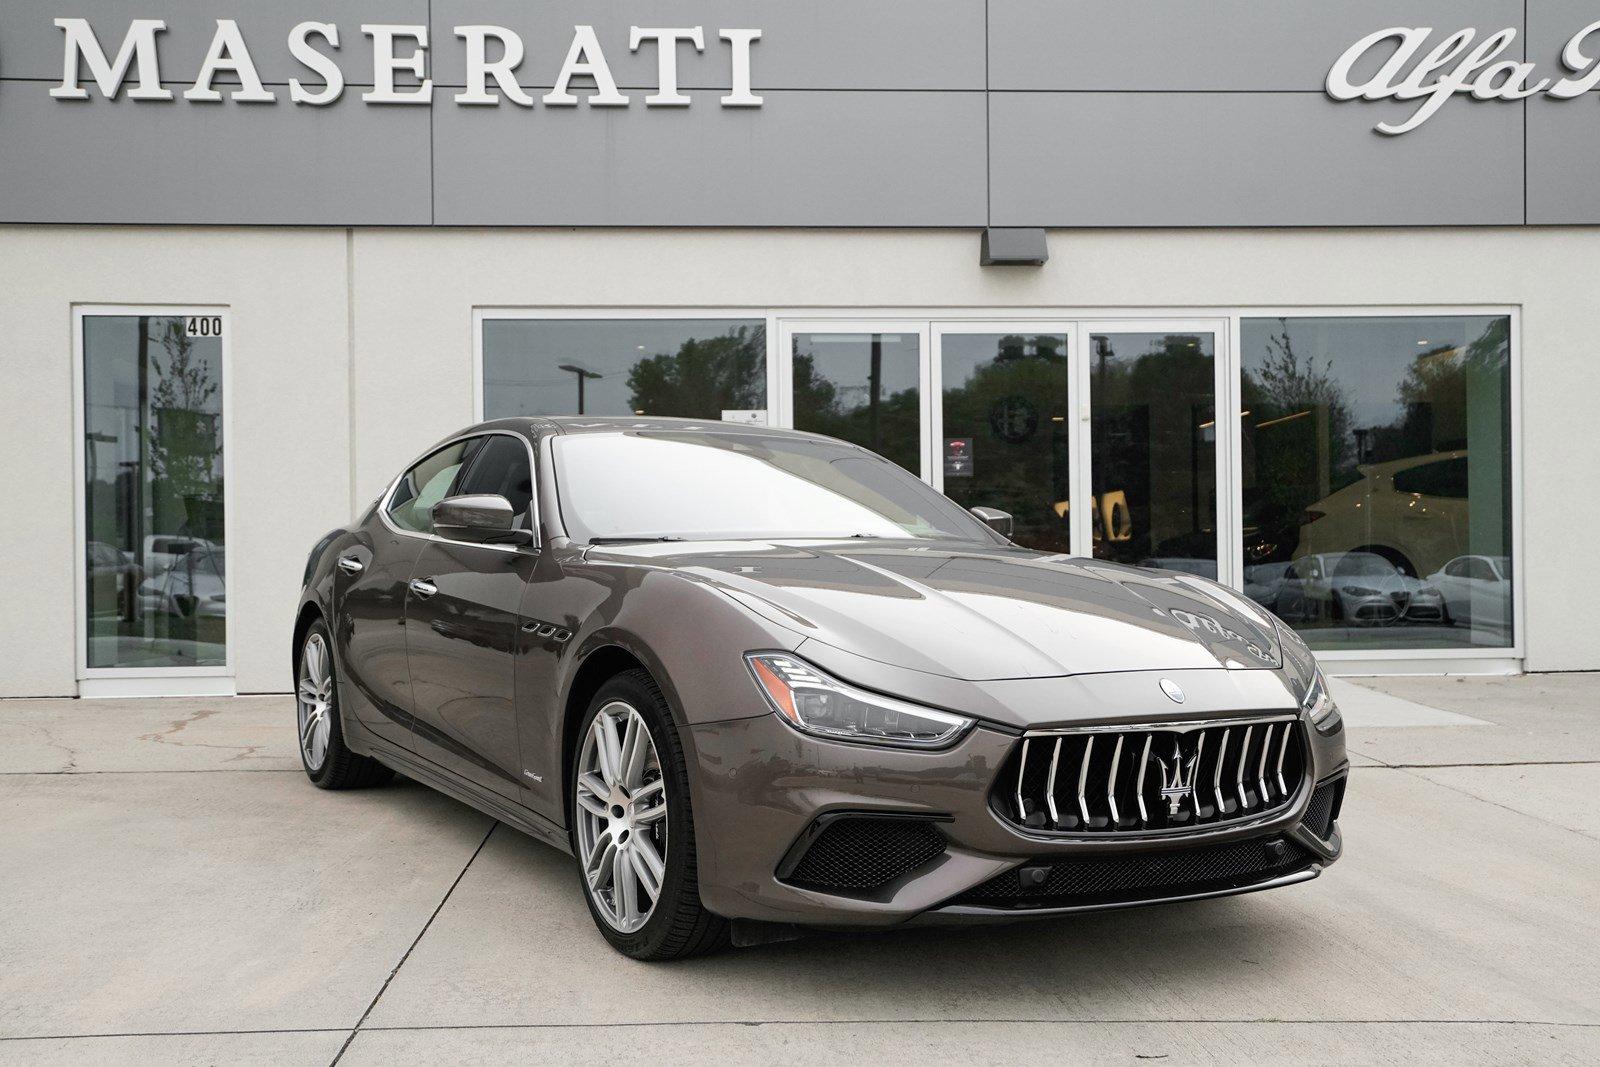 2018 Maserati Ghibli GranSport image